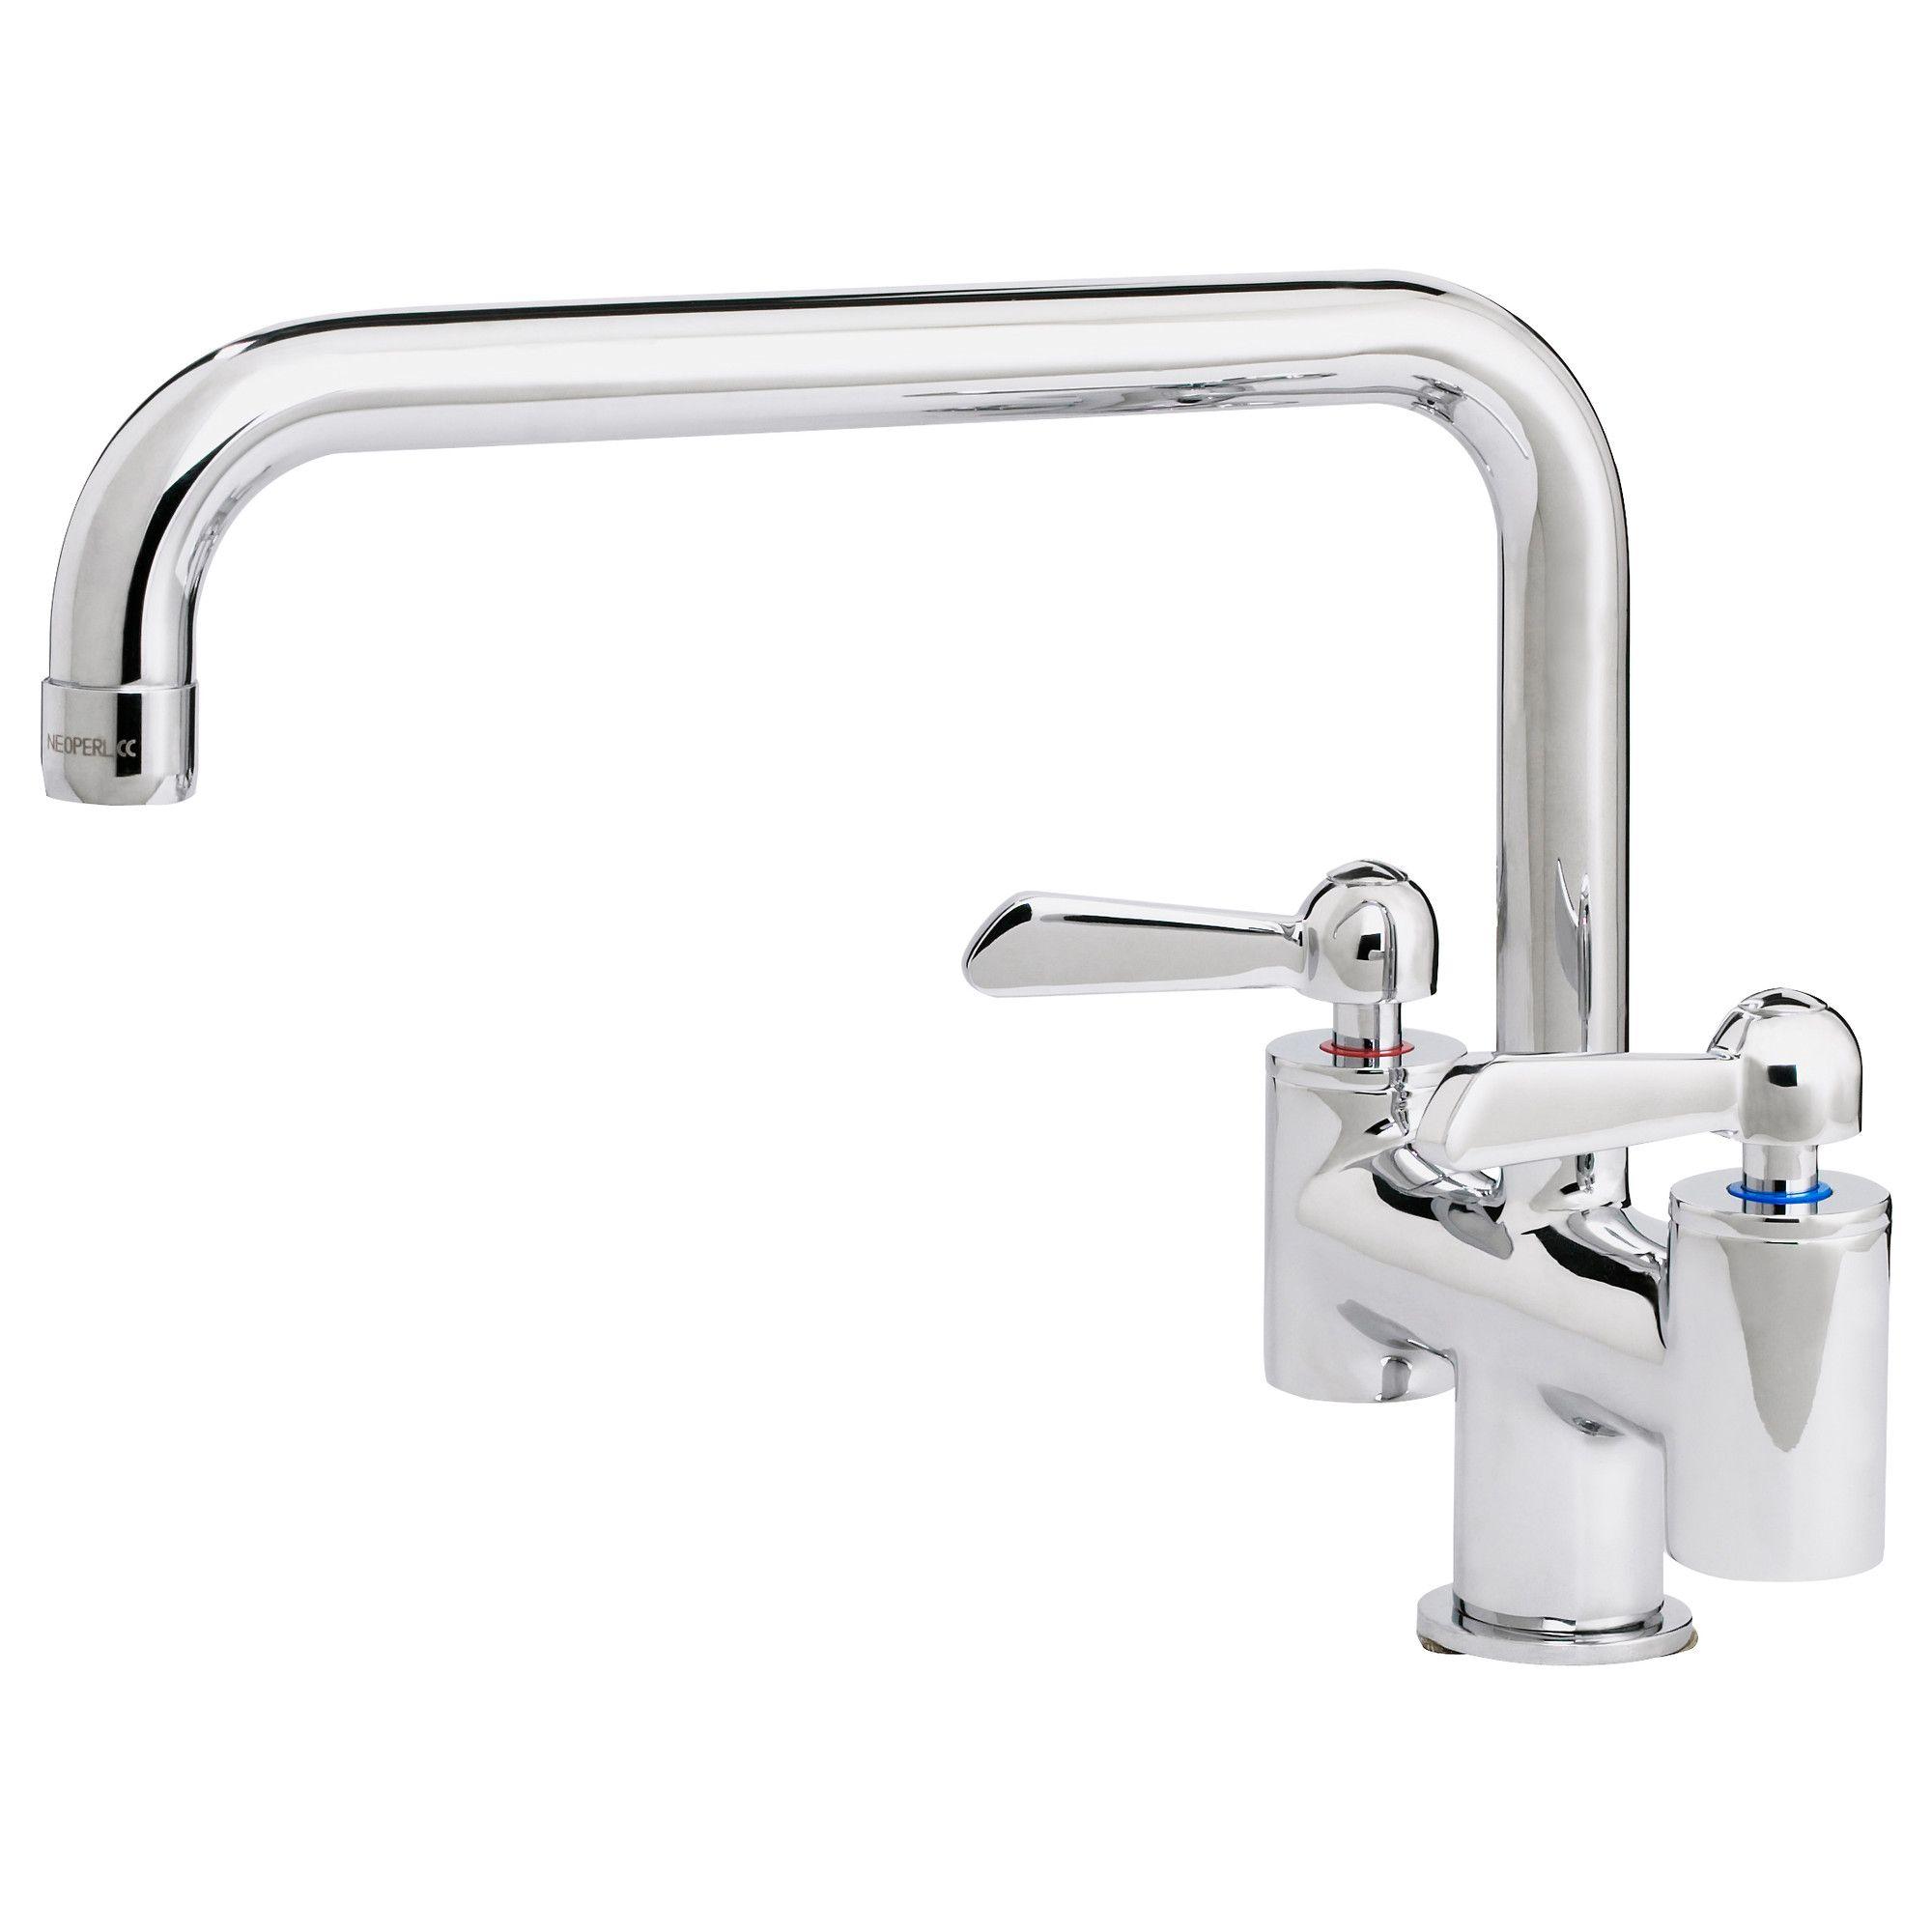 Ikea Kitchen Sinks And Taps